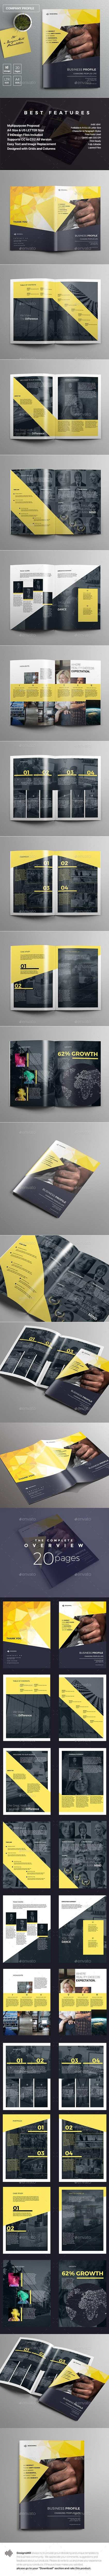 Company Profile | Company profile, Brochures and Template